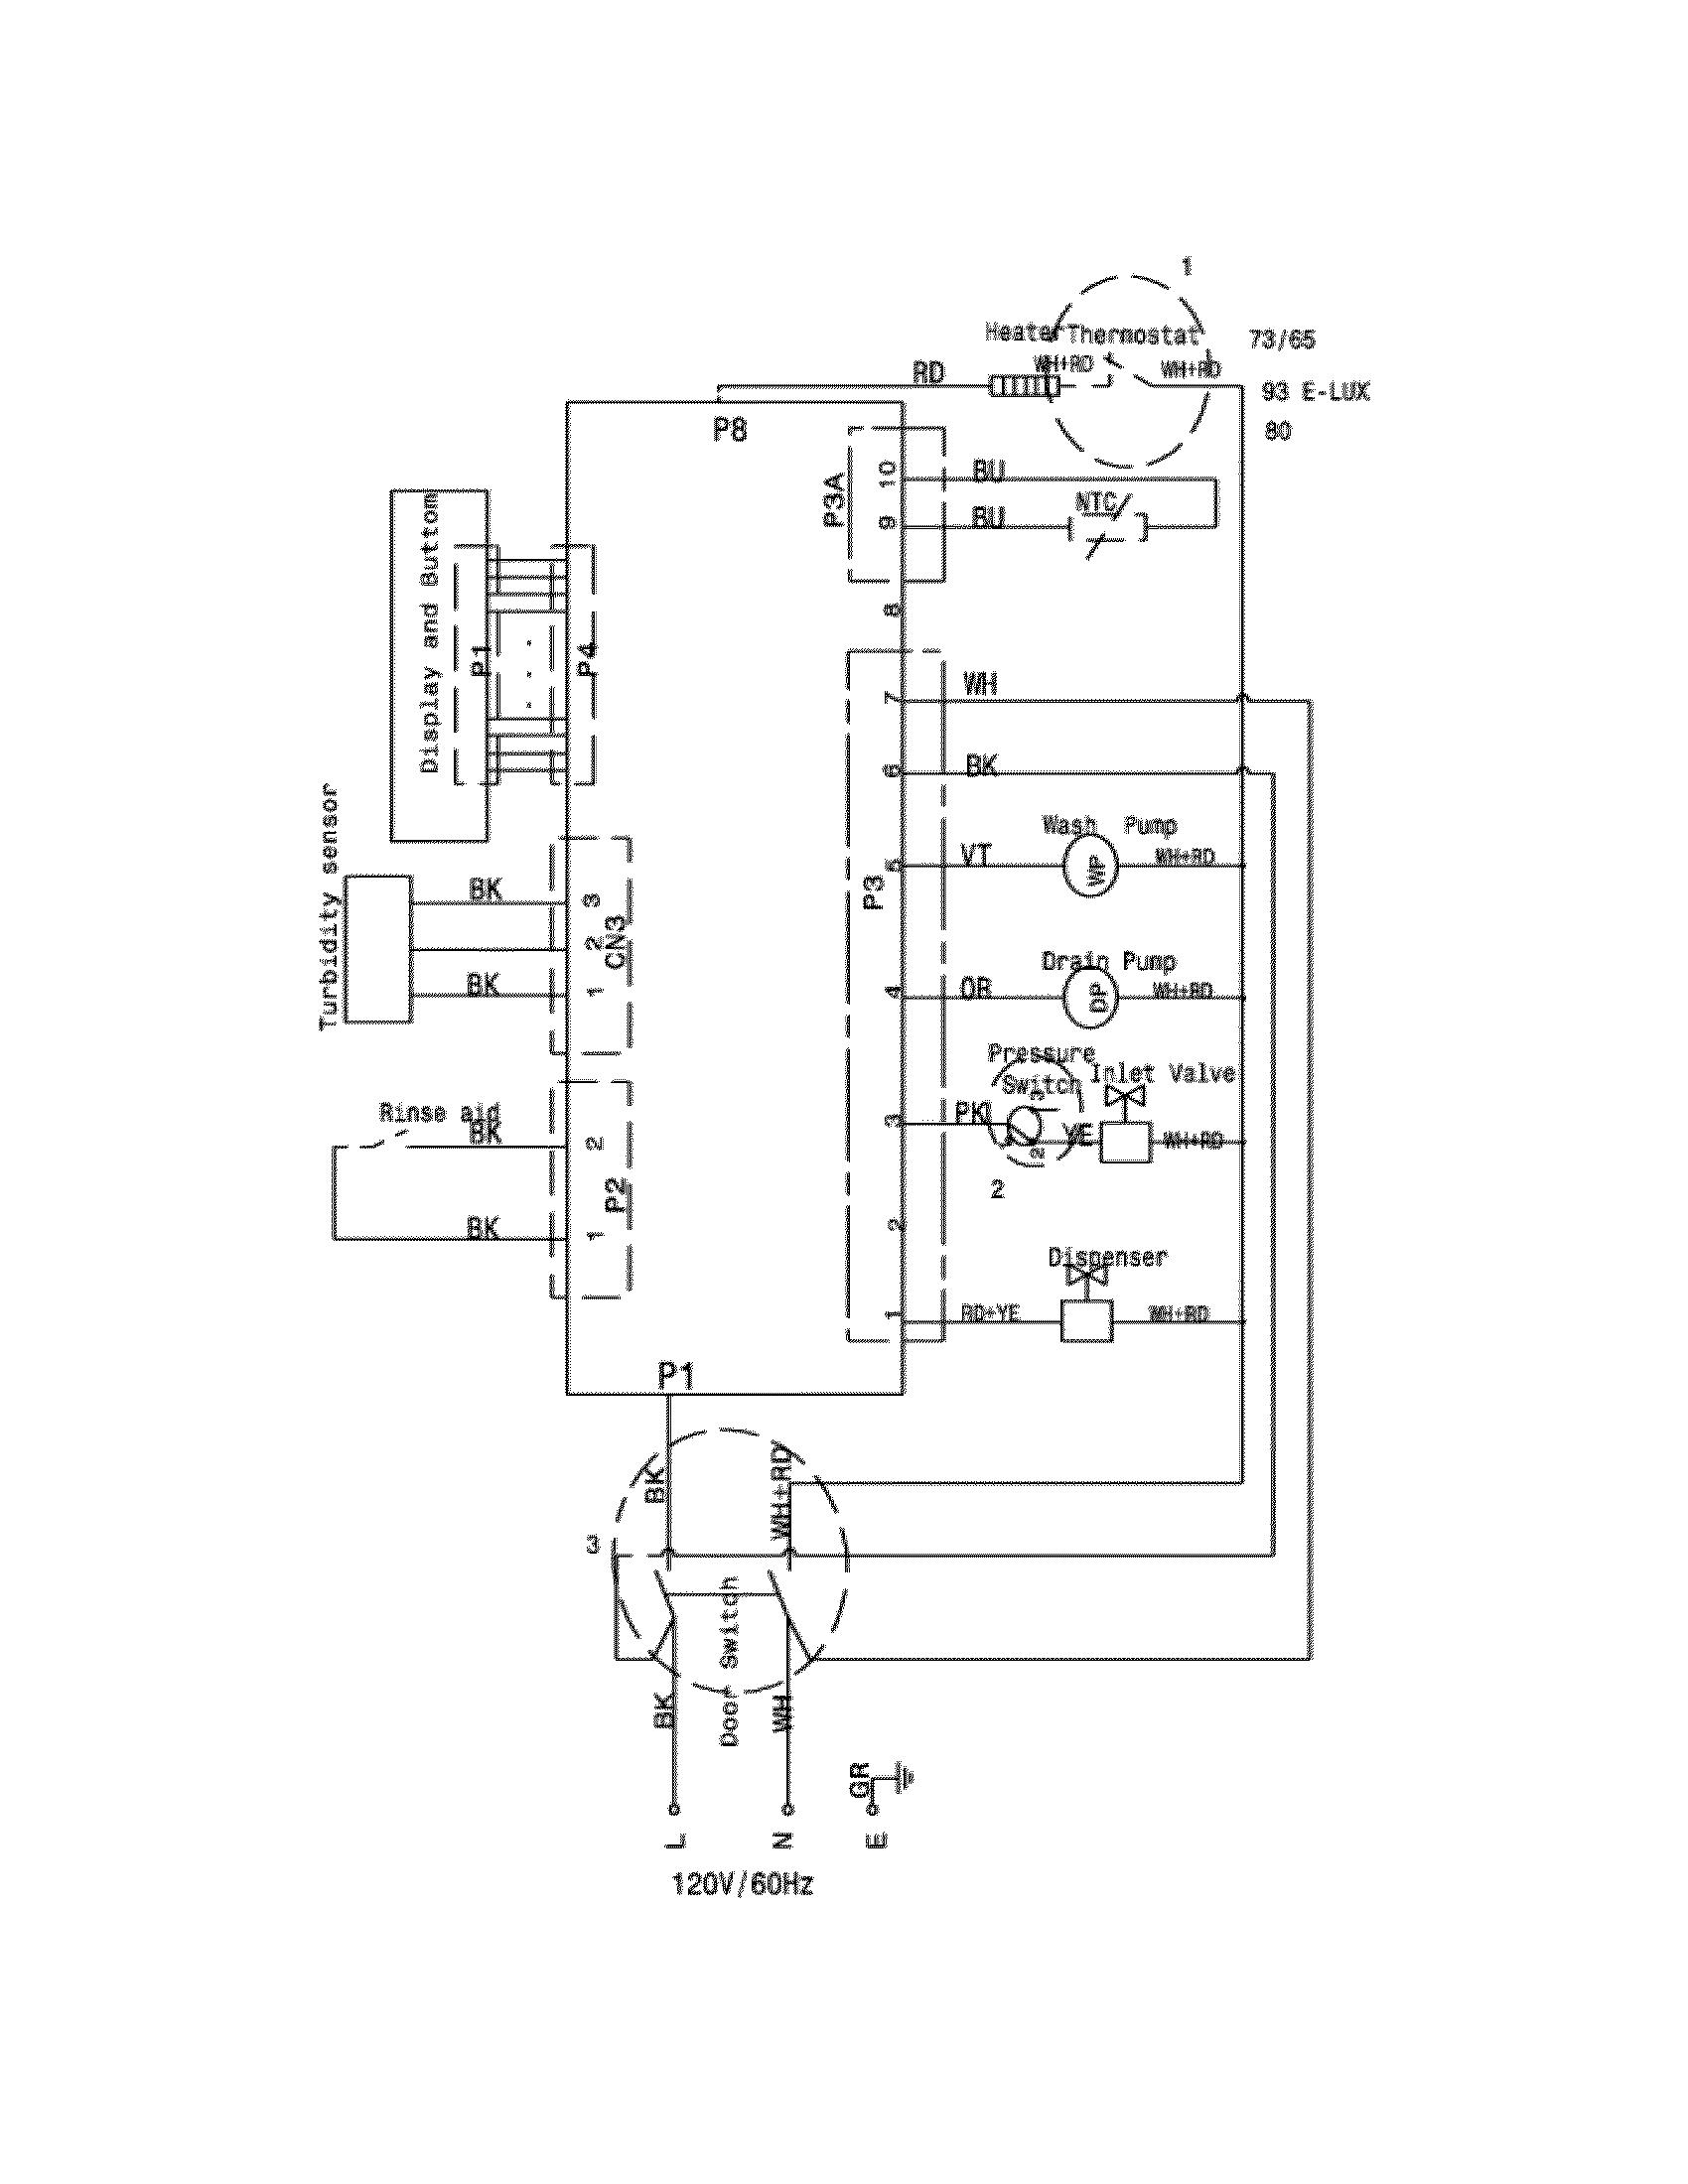 wiring schematic diagram parts list for model fefs52dqd frigidaire